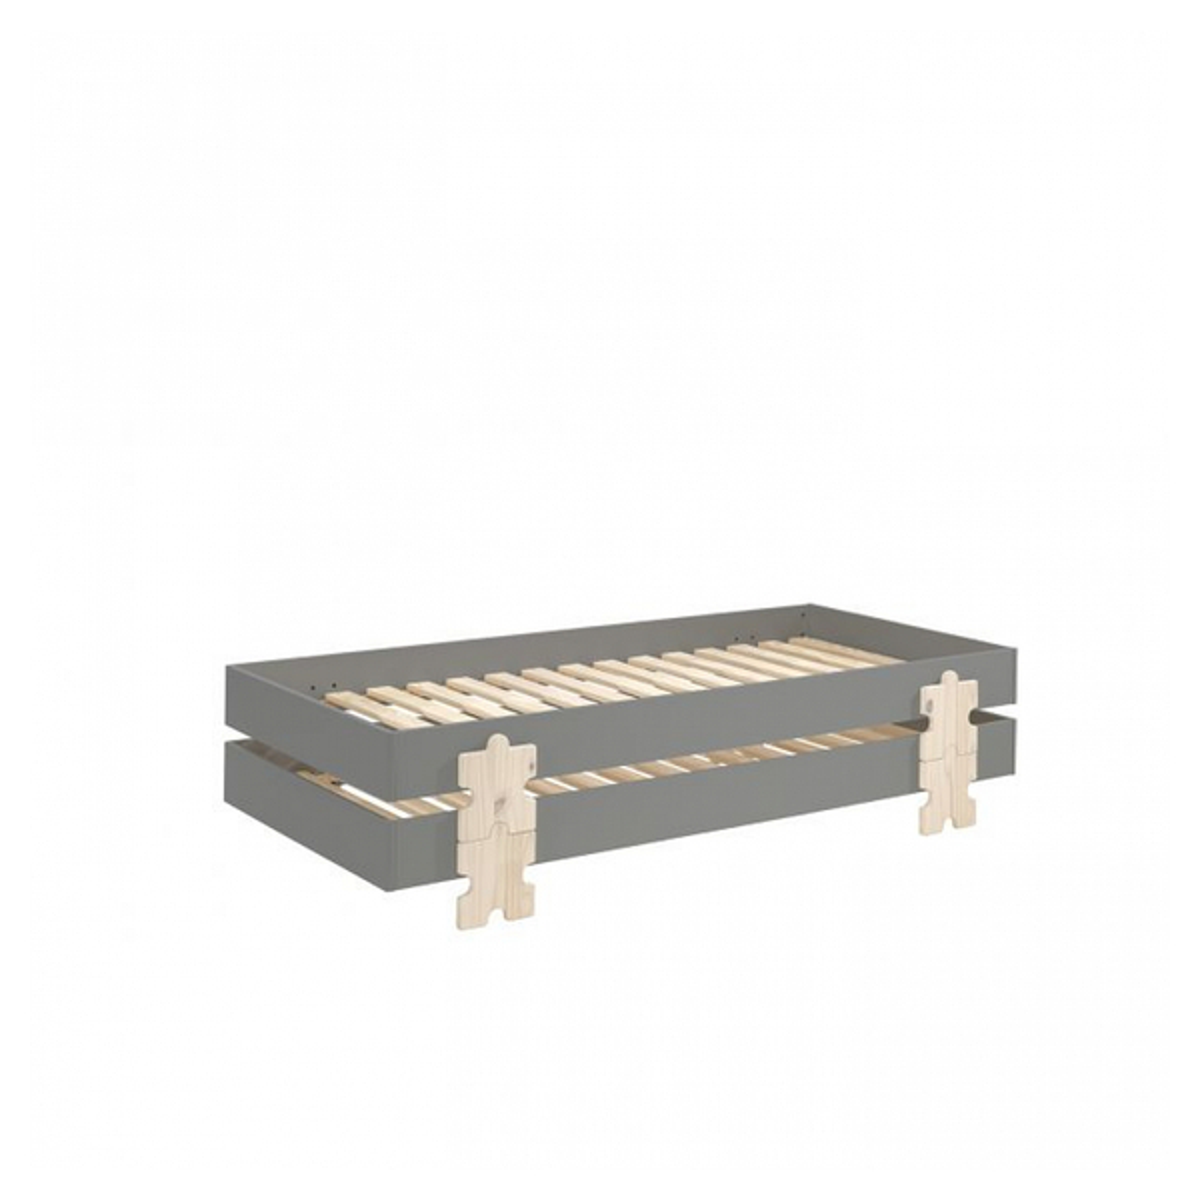 Vipack - 2 Lits Modulo Puzzle Gris Empilables 90x200 L 203,6 x Lg 93,8 x